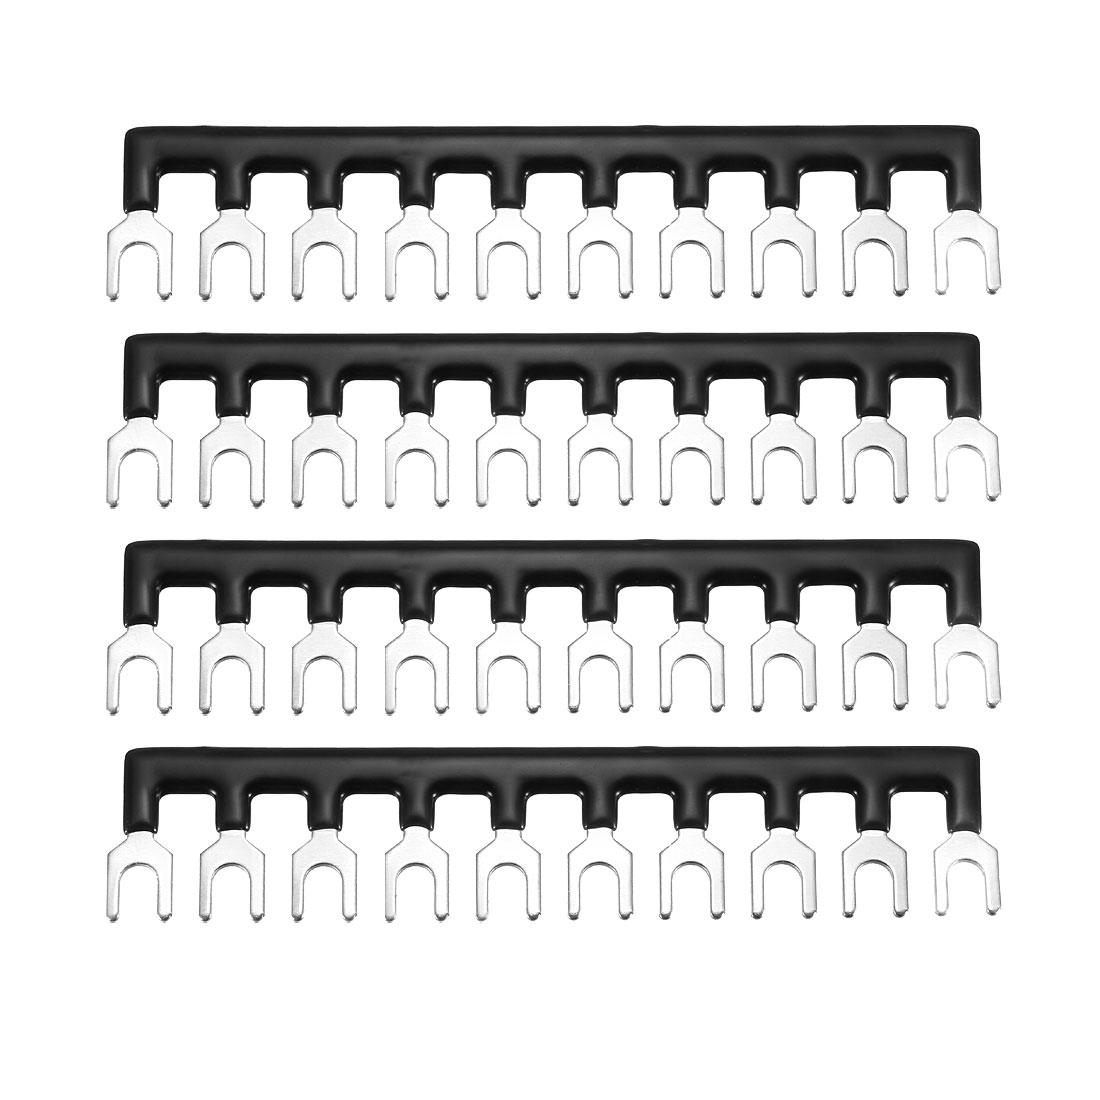 600V 20A 10 Positions Terminal Block Barrier Strip Fork Type Black 4 Pcs